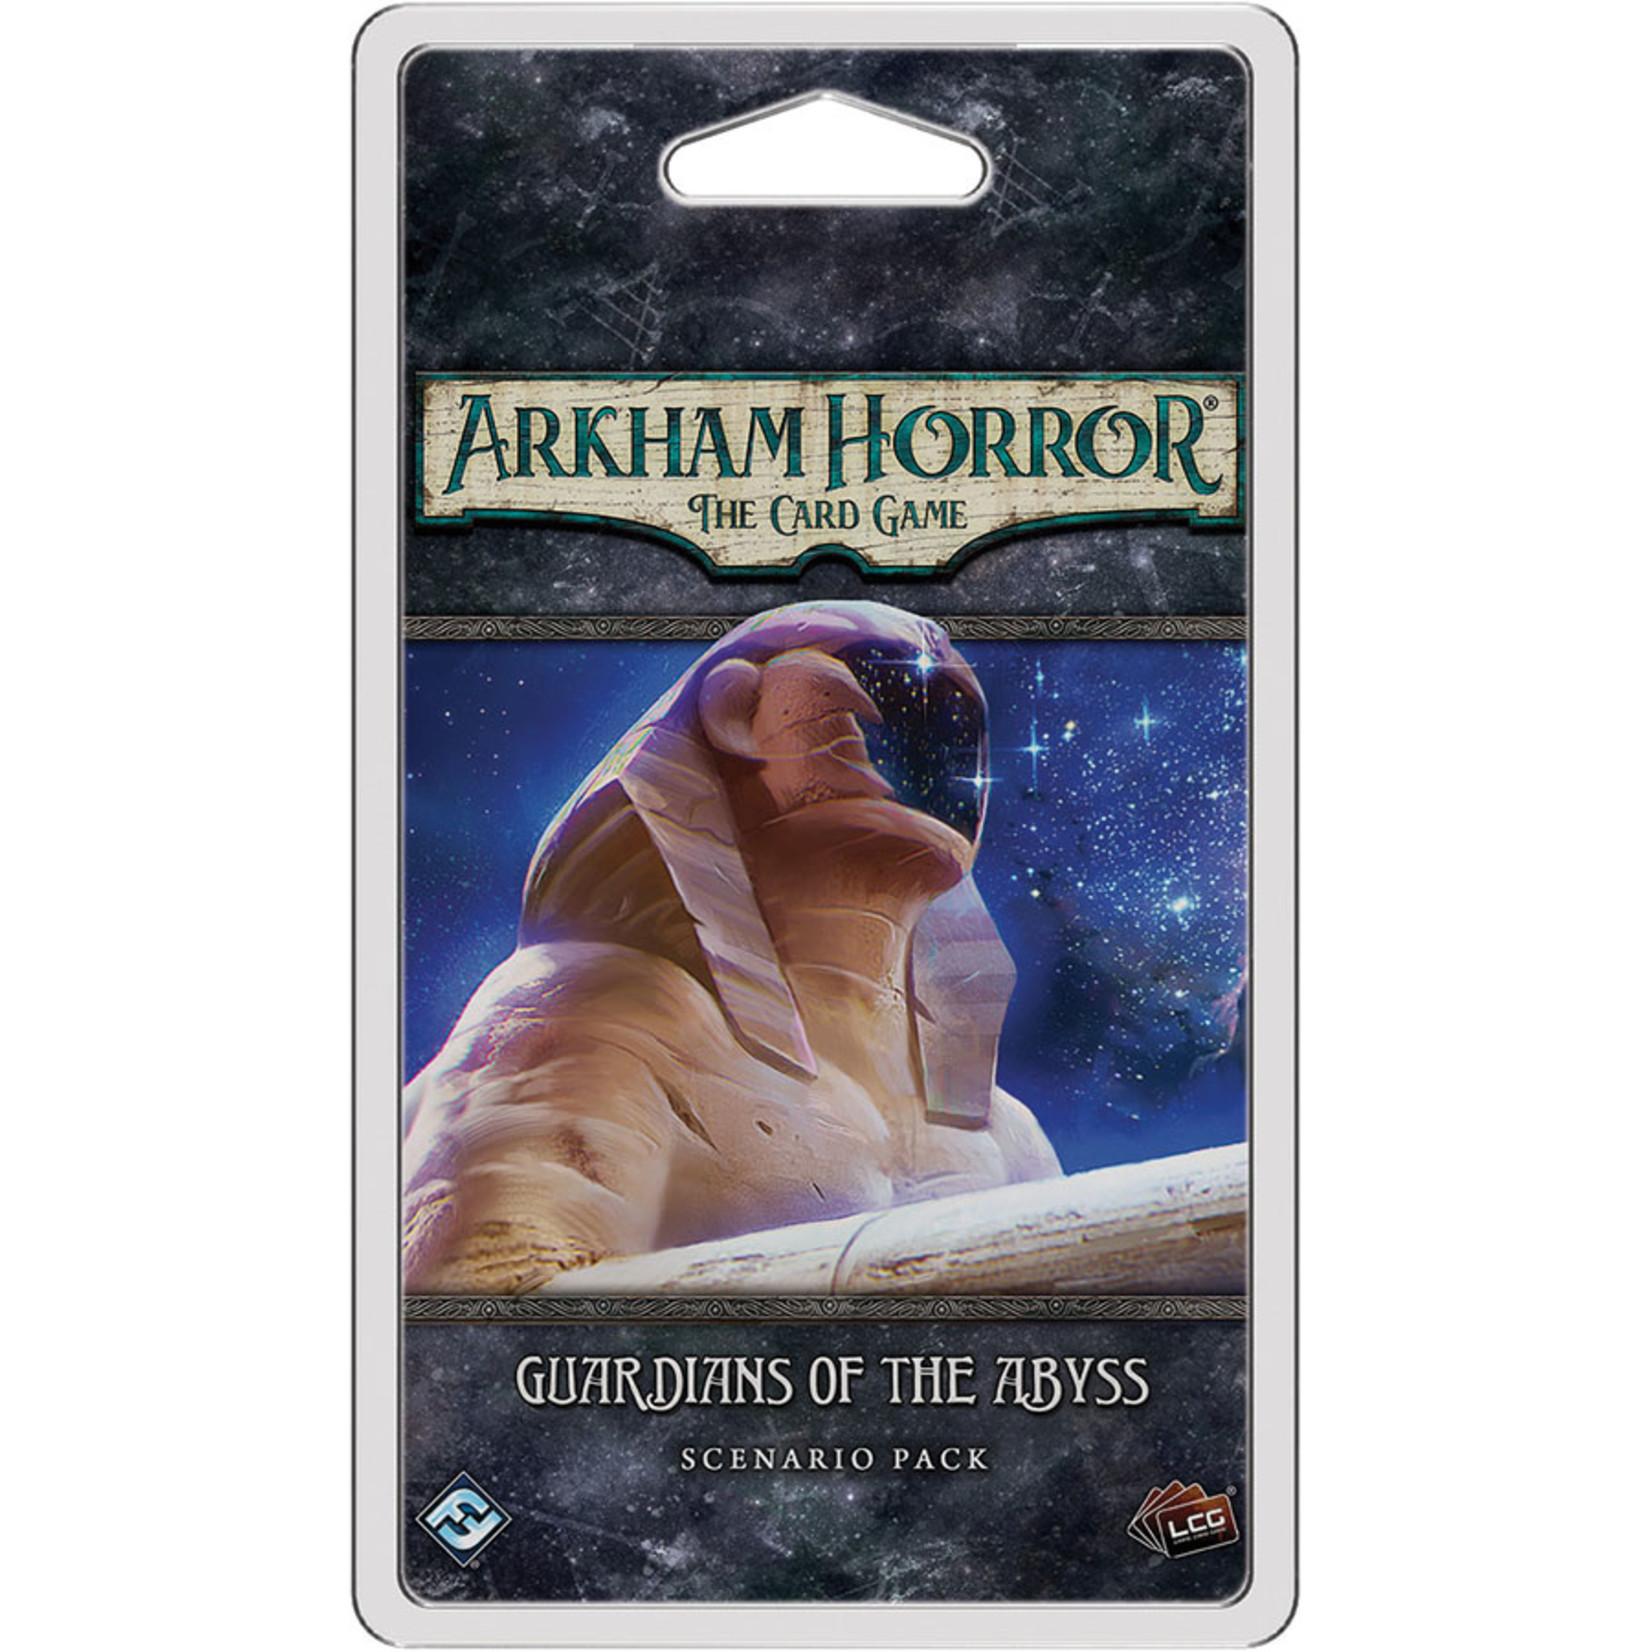 Fantasy Flight Games AH LCG: Guardians of the Abyss Scenario Pack